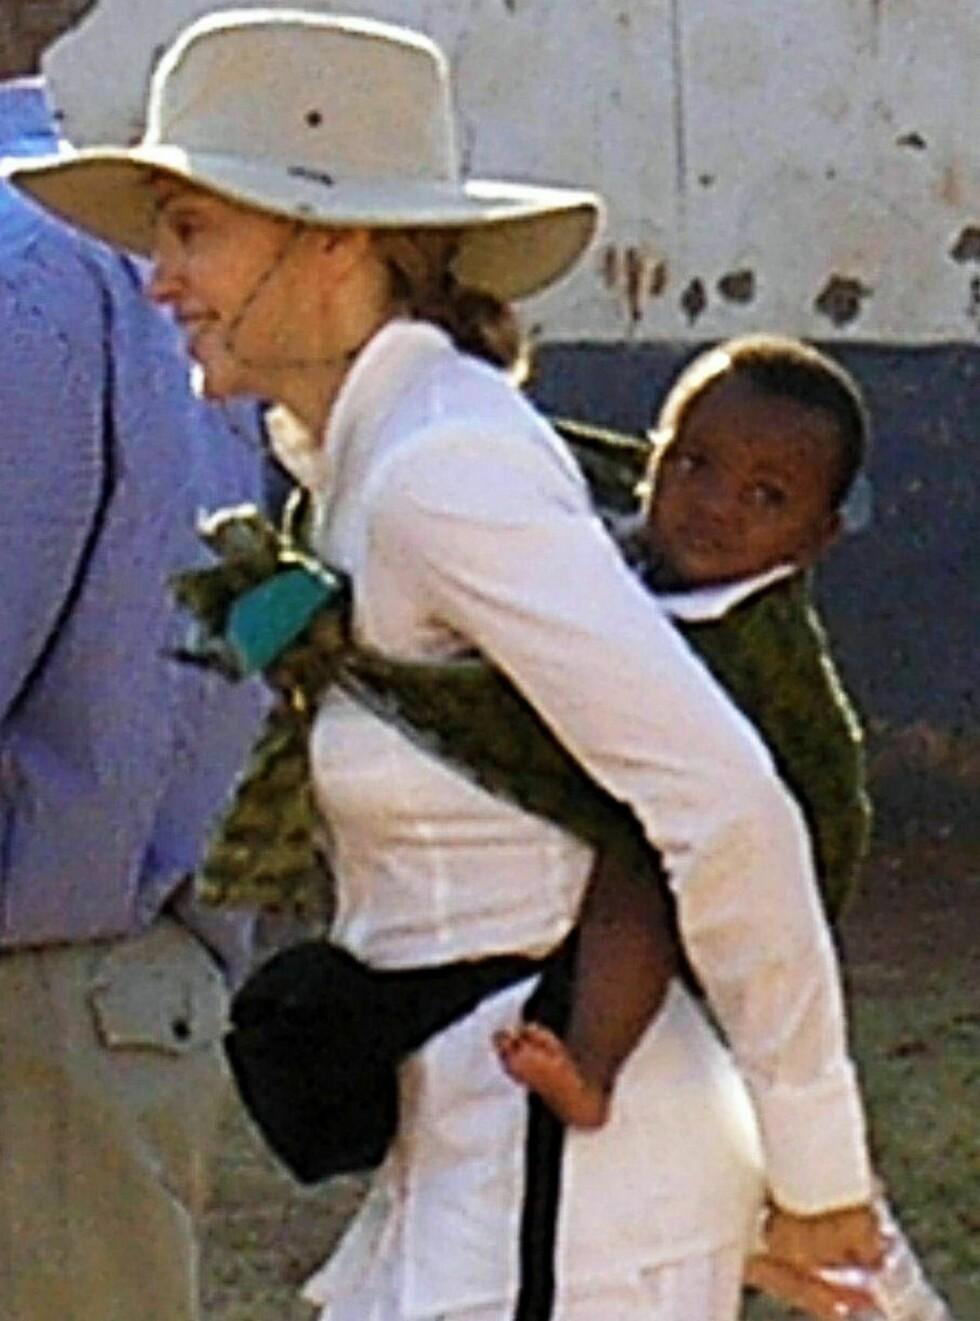 I AFRIKA: Madonna adopterte ettårige David fra Malawi. Nå ønsker hun seg en jente fra samme landsby!  Foto: BULLS